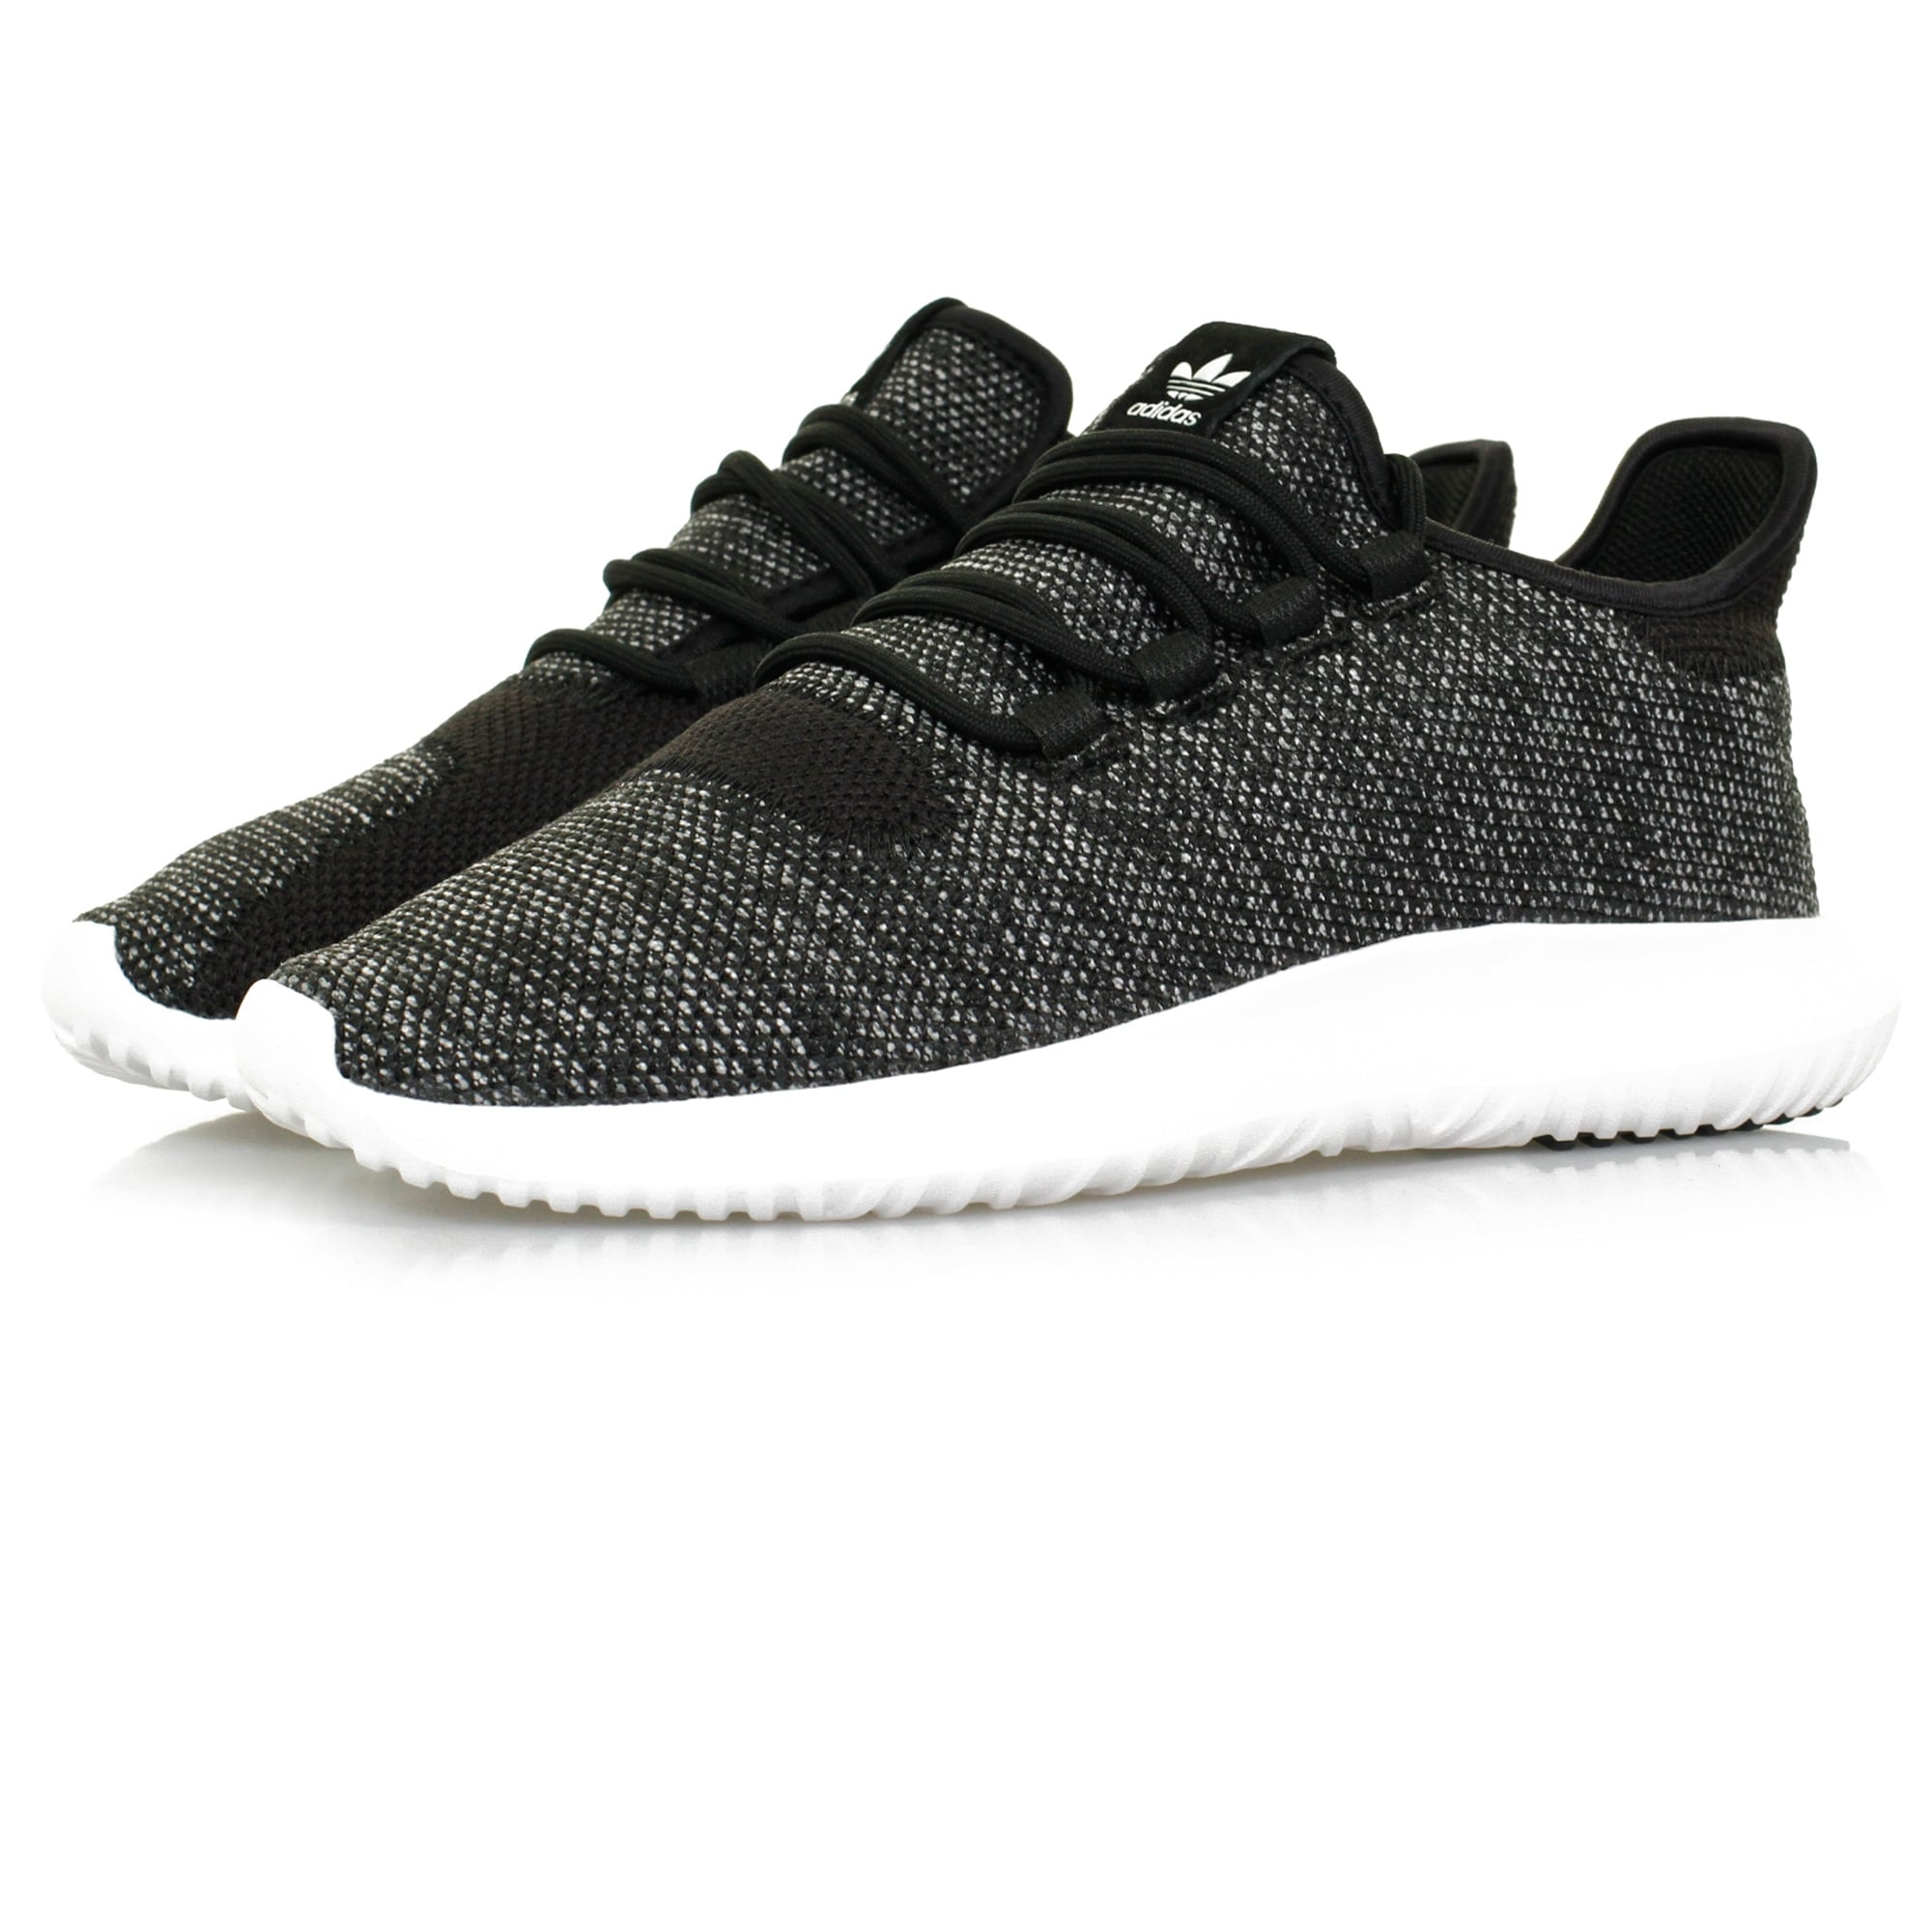 Adidas Originals Tubular Shadow Knit Black Shoe BB8826